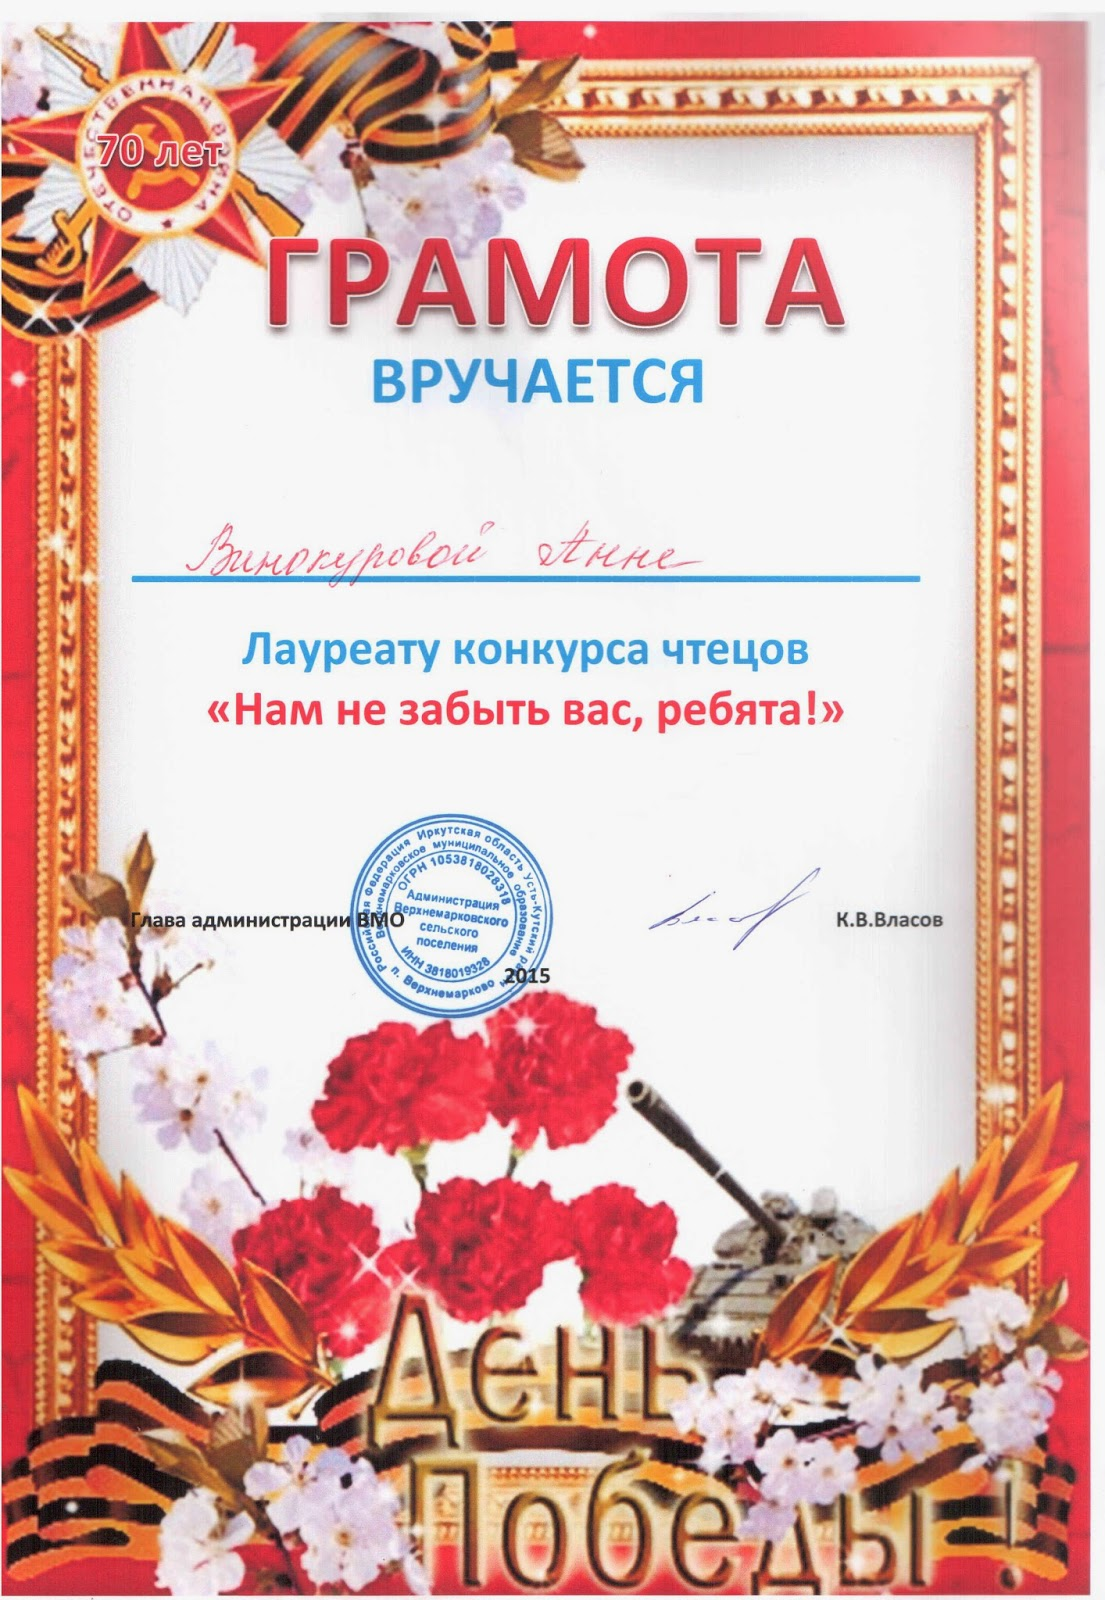 Шаблон диплома участнику конкурса чтецов